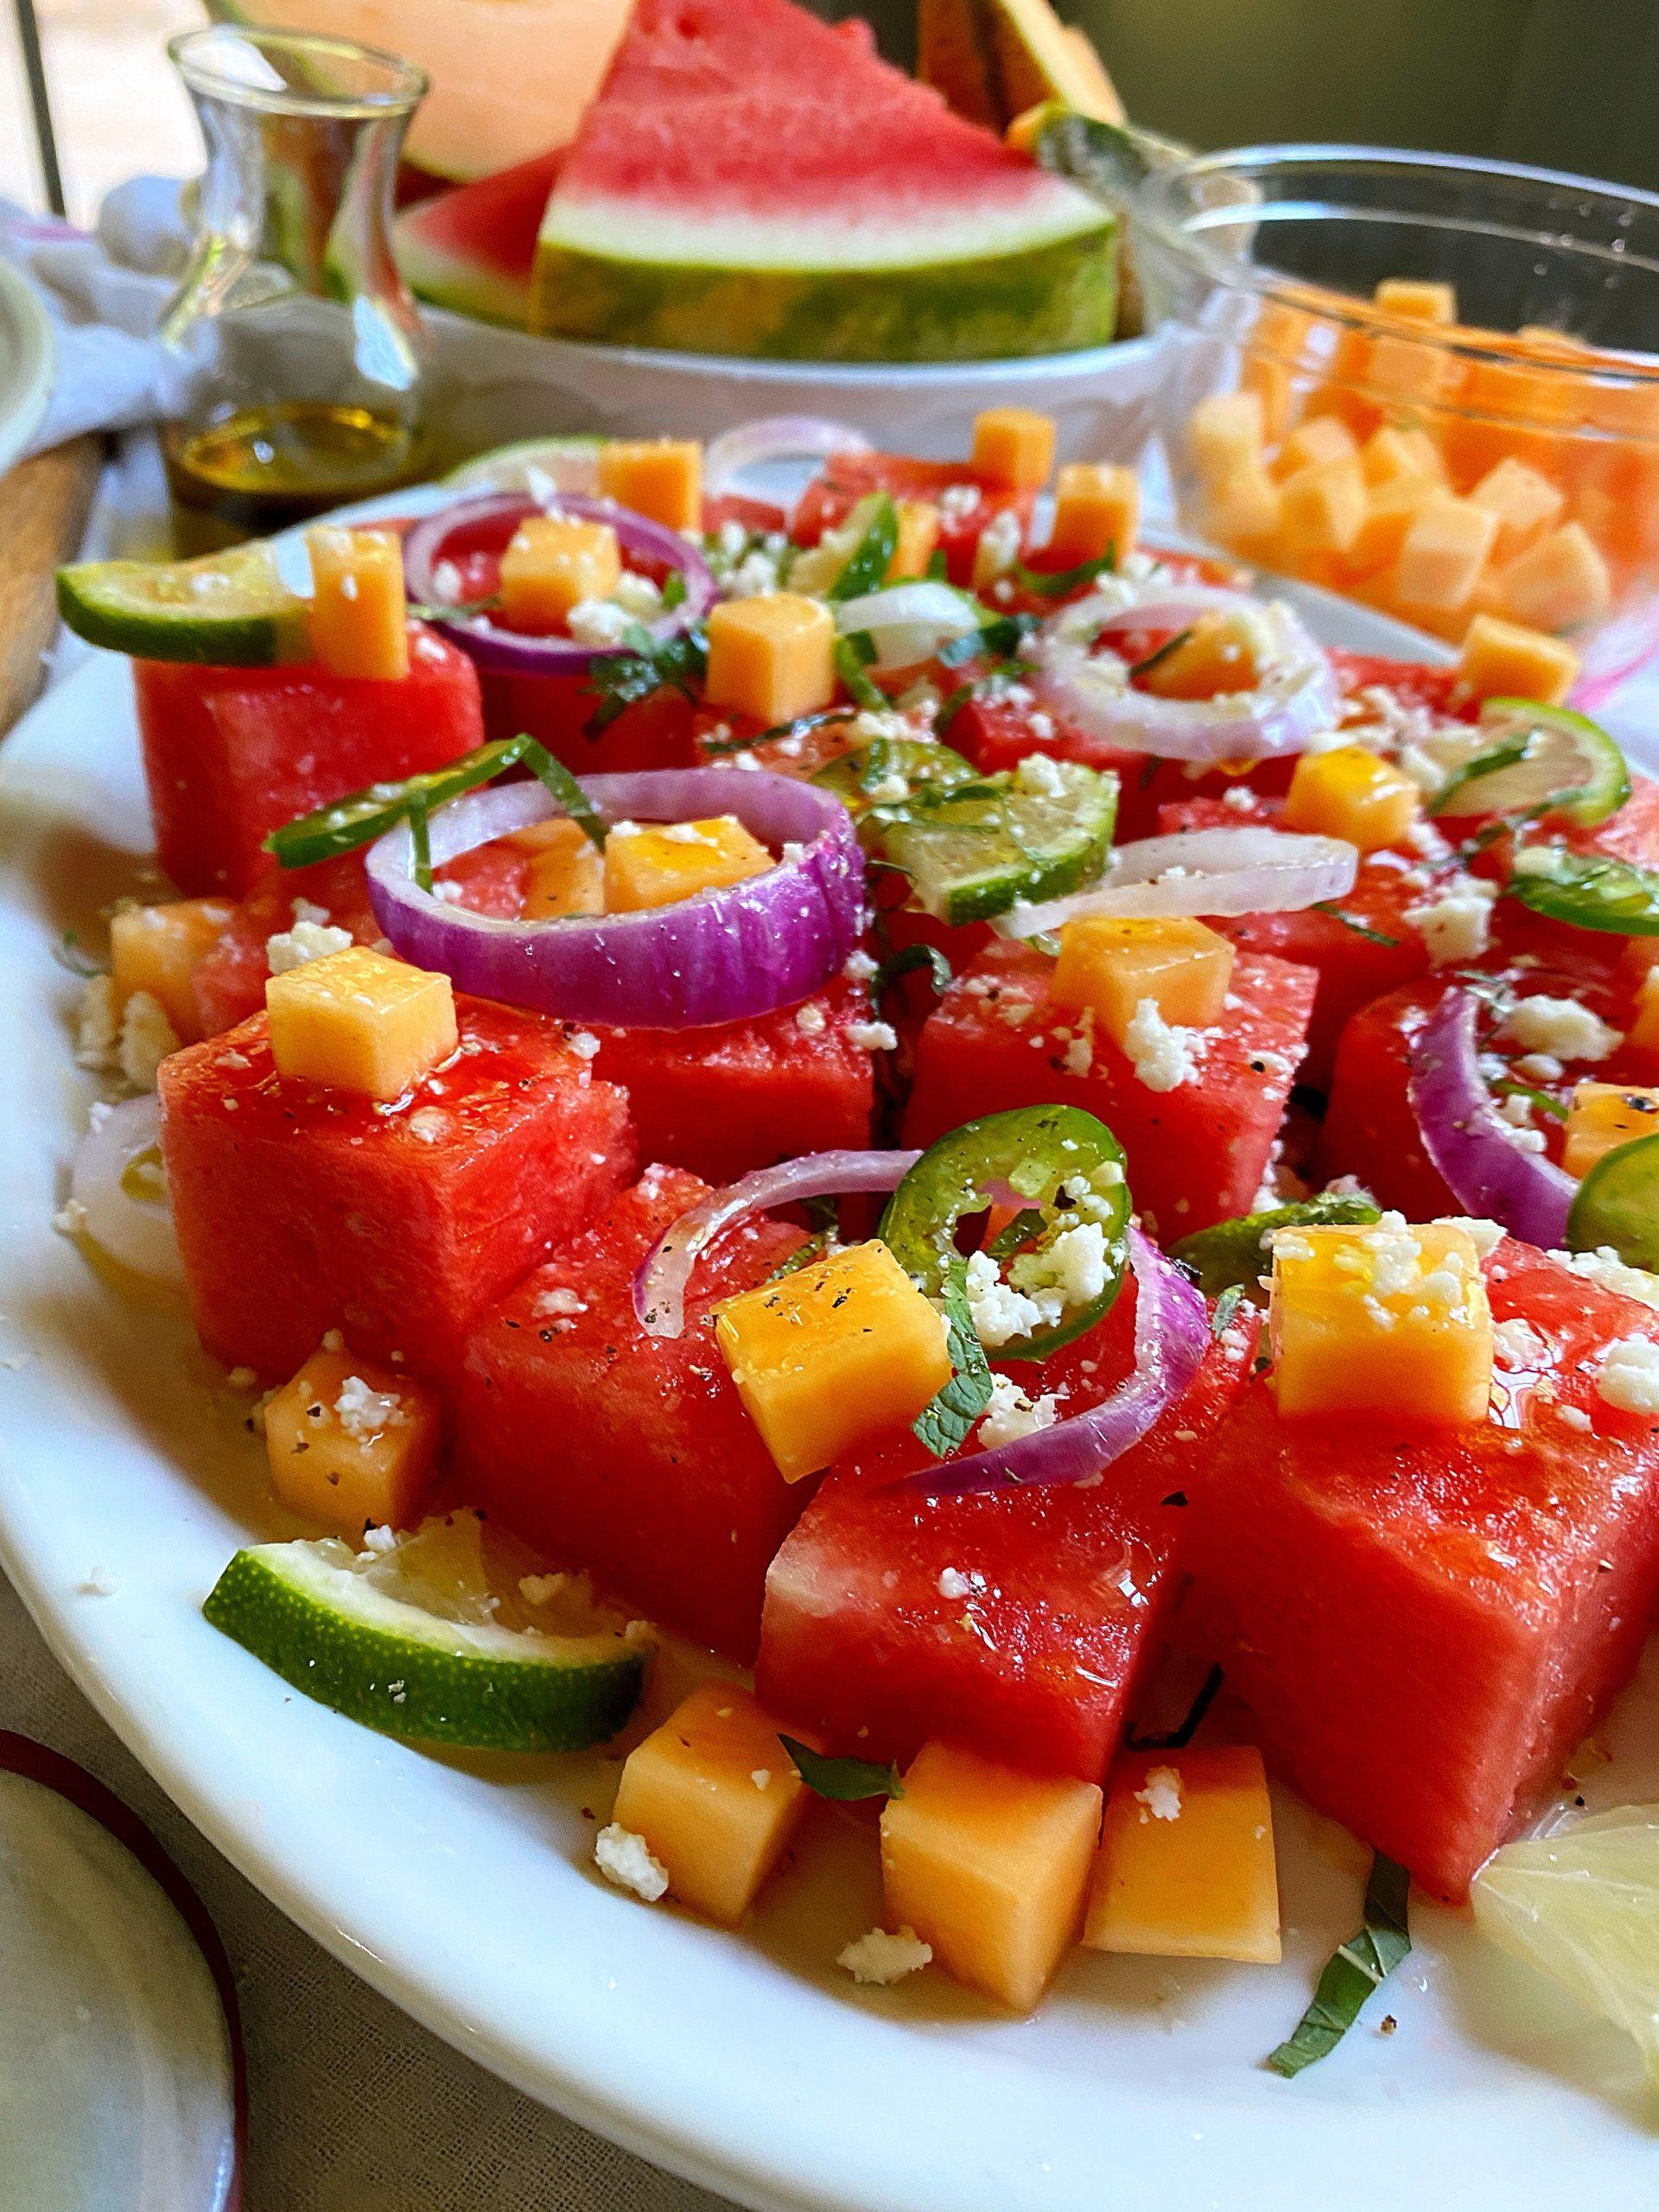 mojito melon summer salad platter